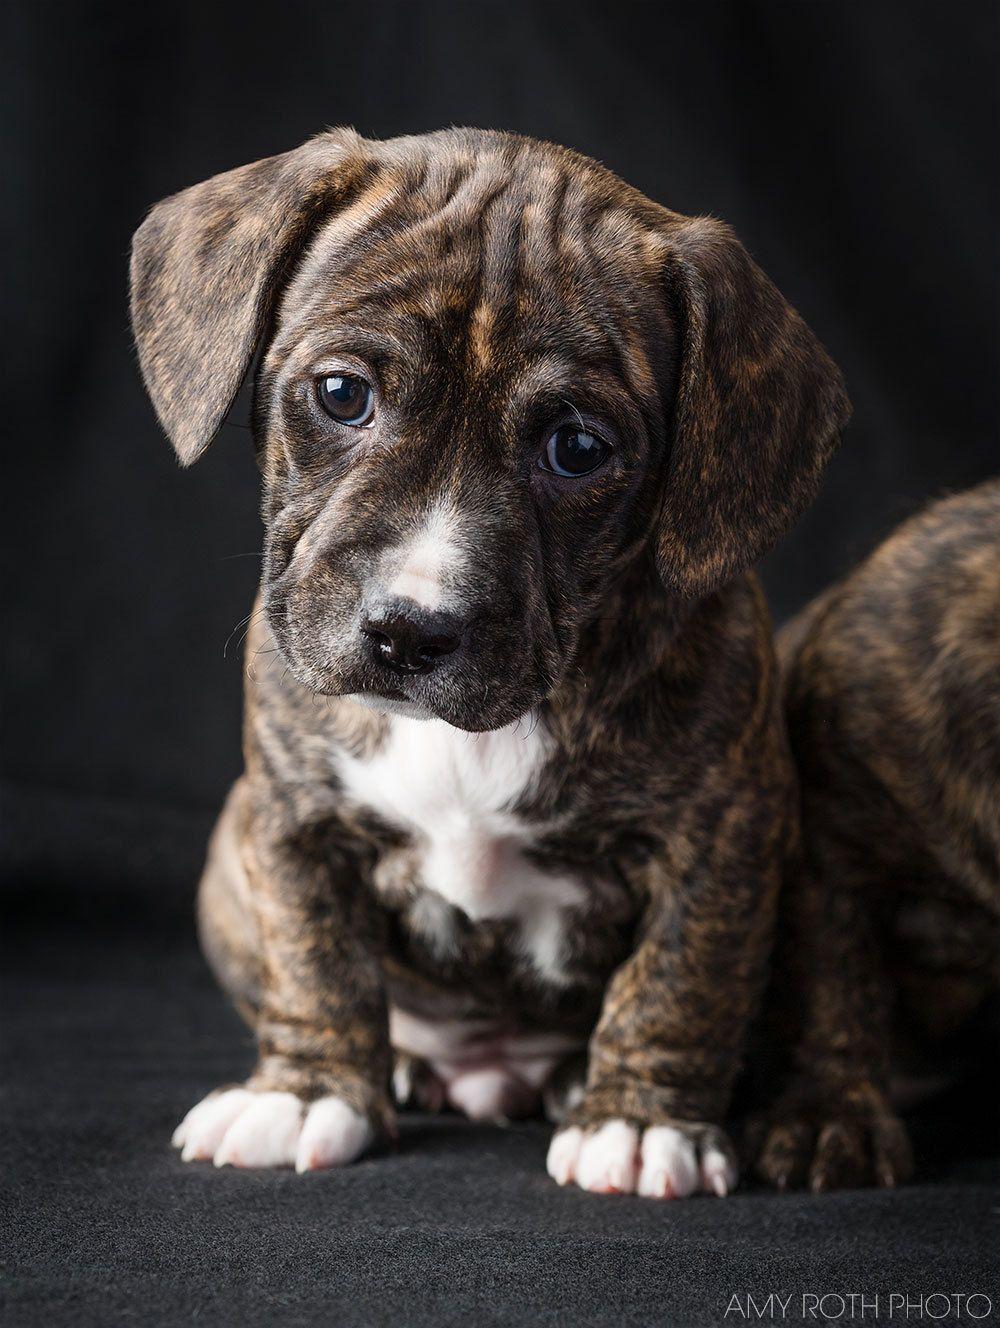 Puppy Nursery Decor Dachshund Pitbull Puppies Picture Dog